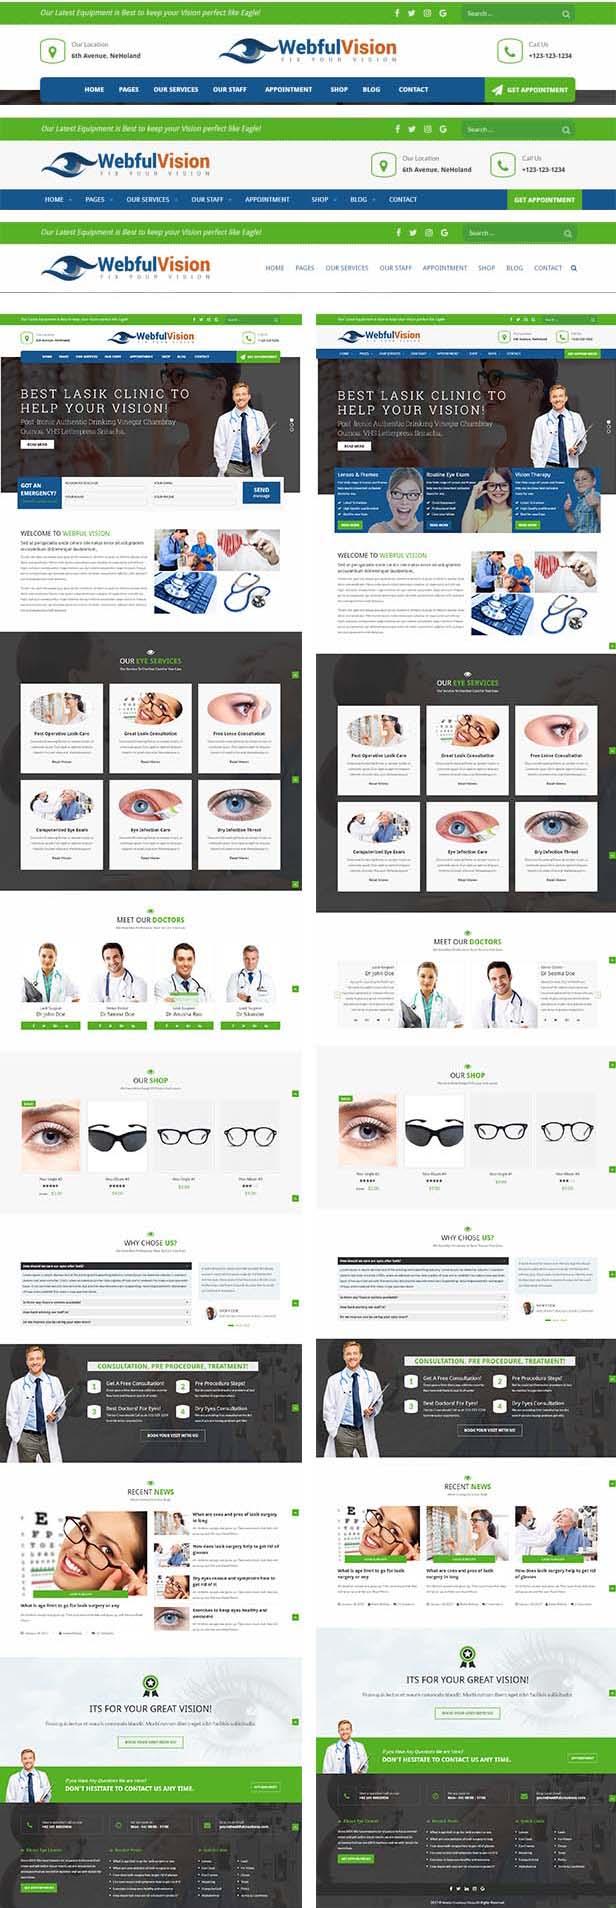 optometrist WordPress theme built in Styles